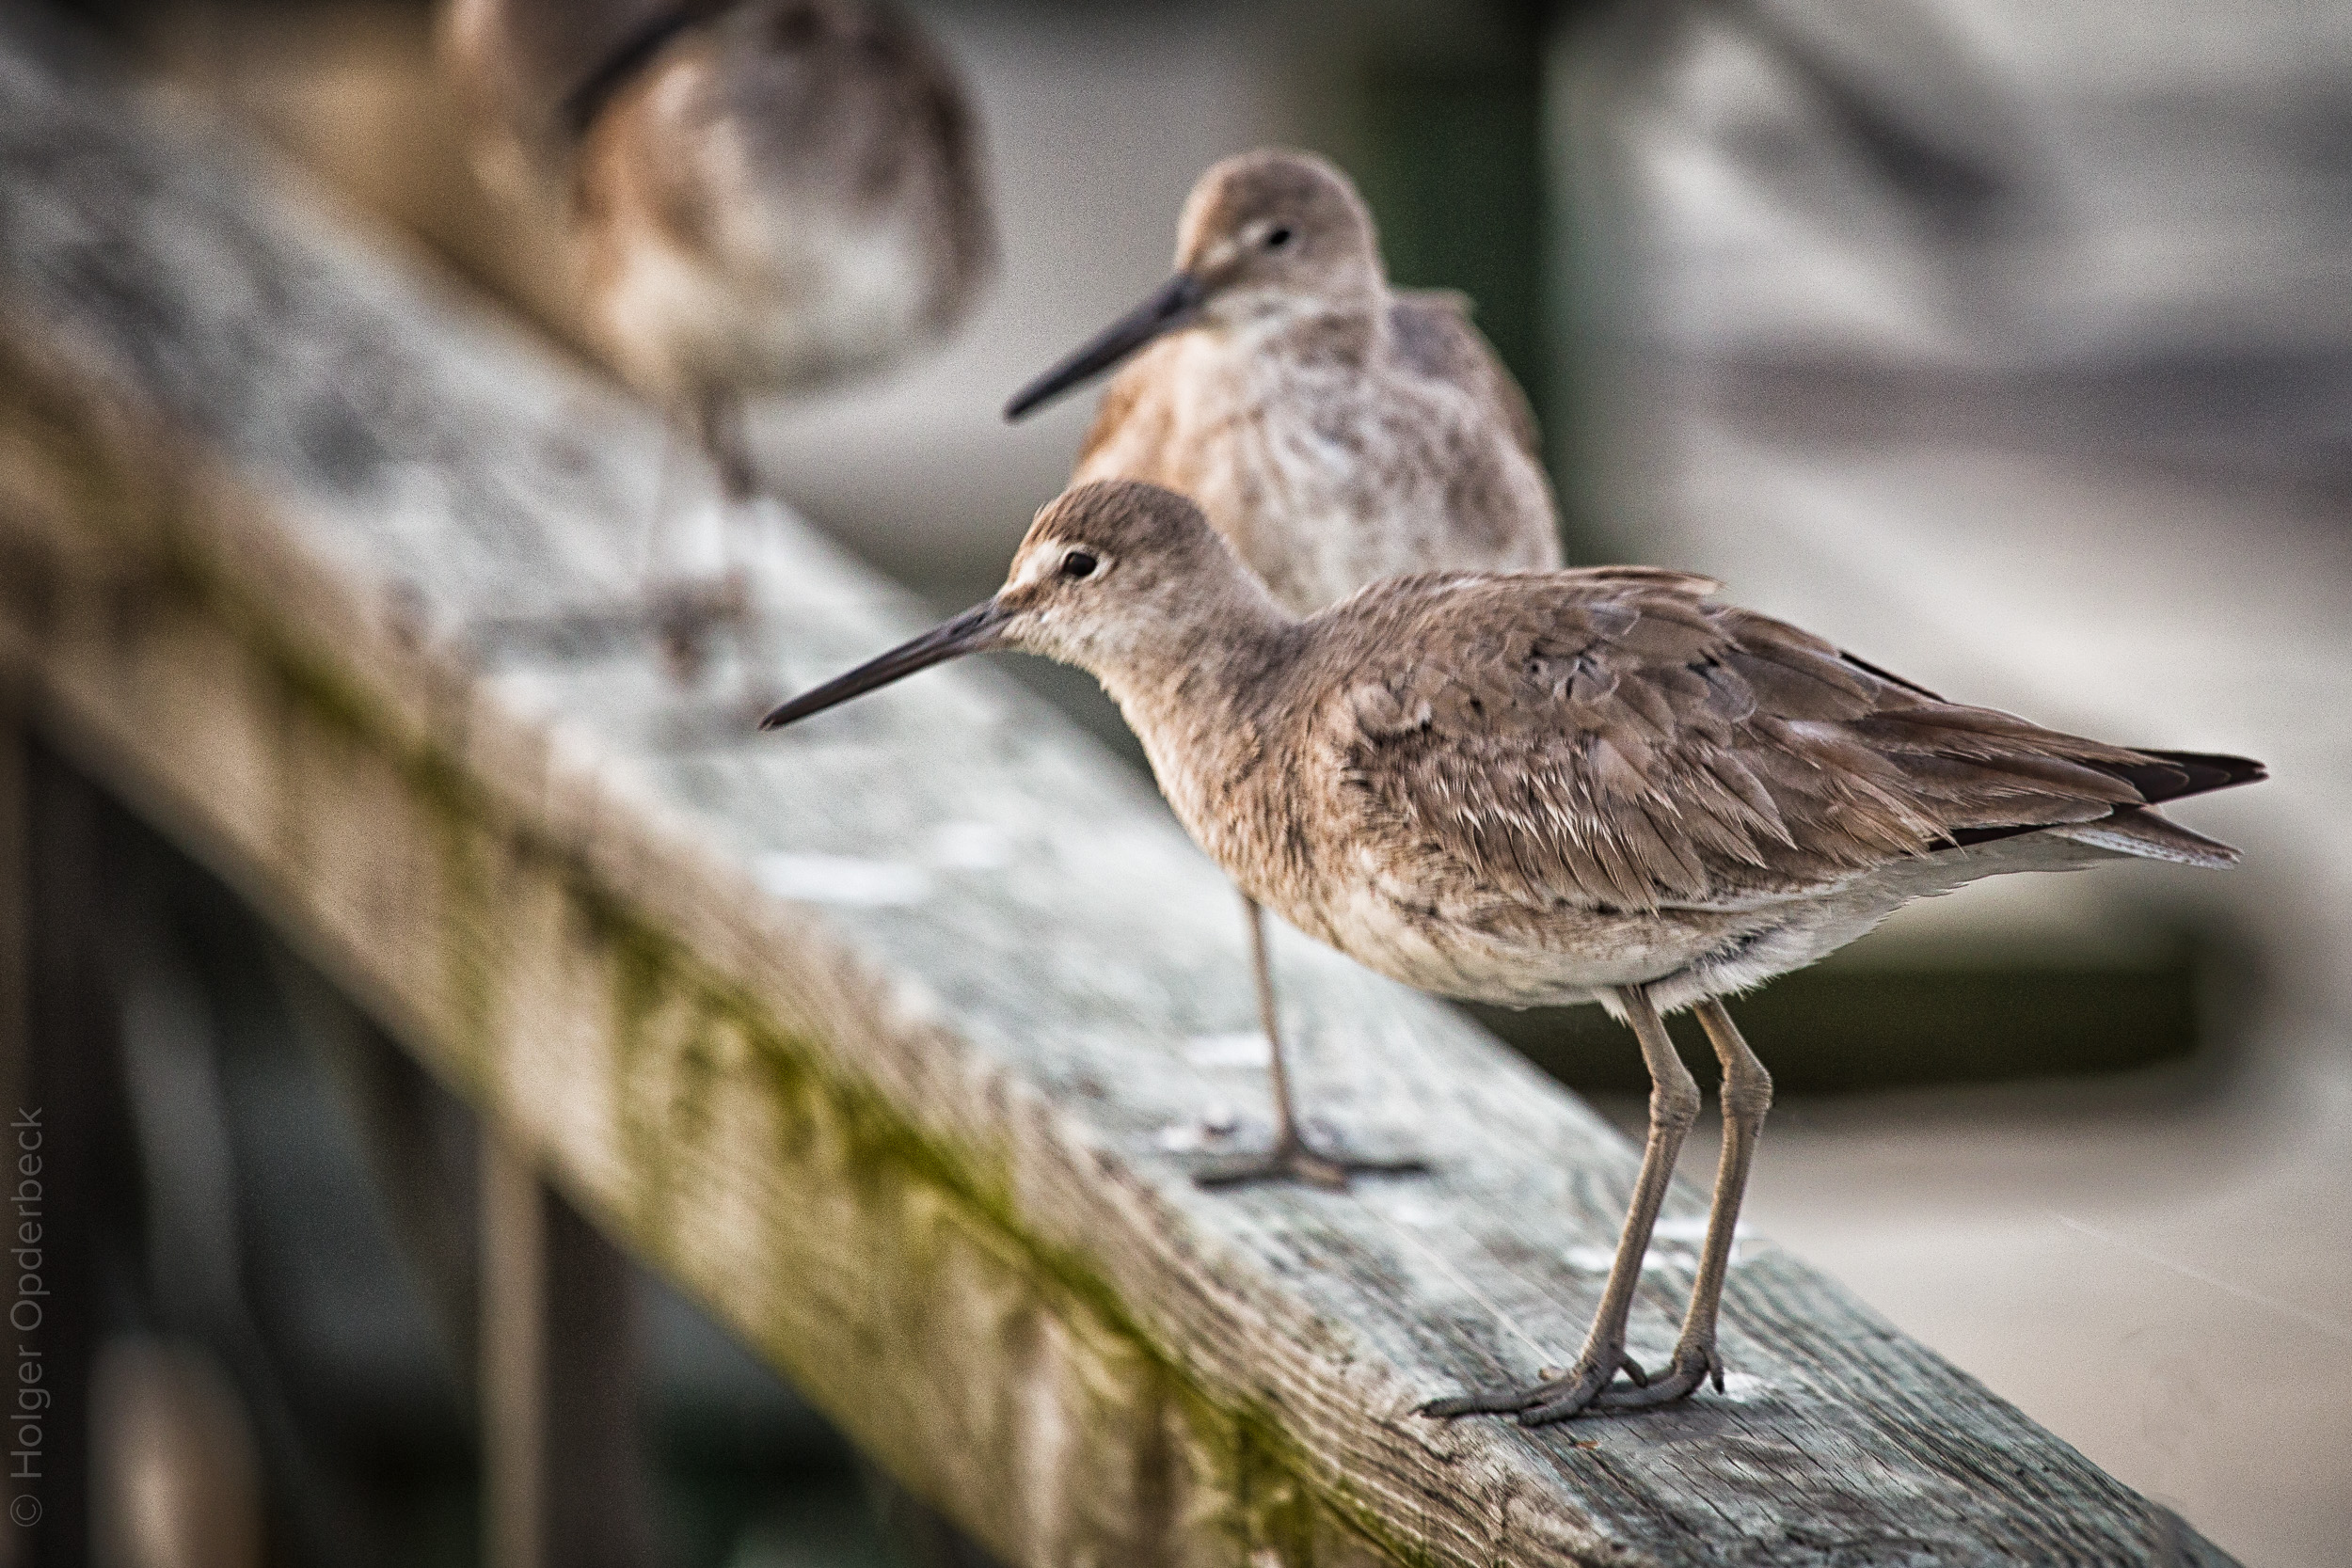 040 two-birds-on-handrail.jpg